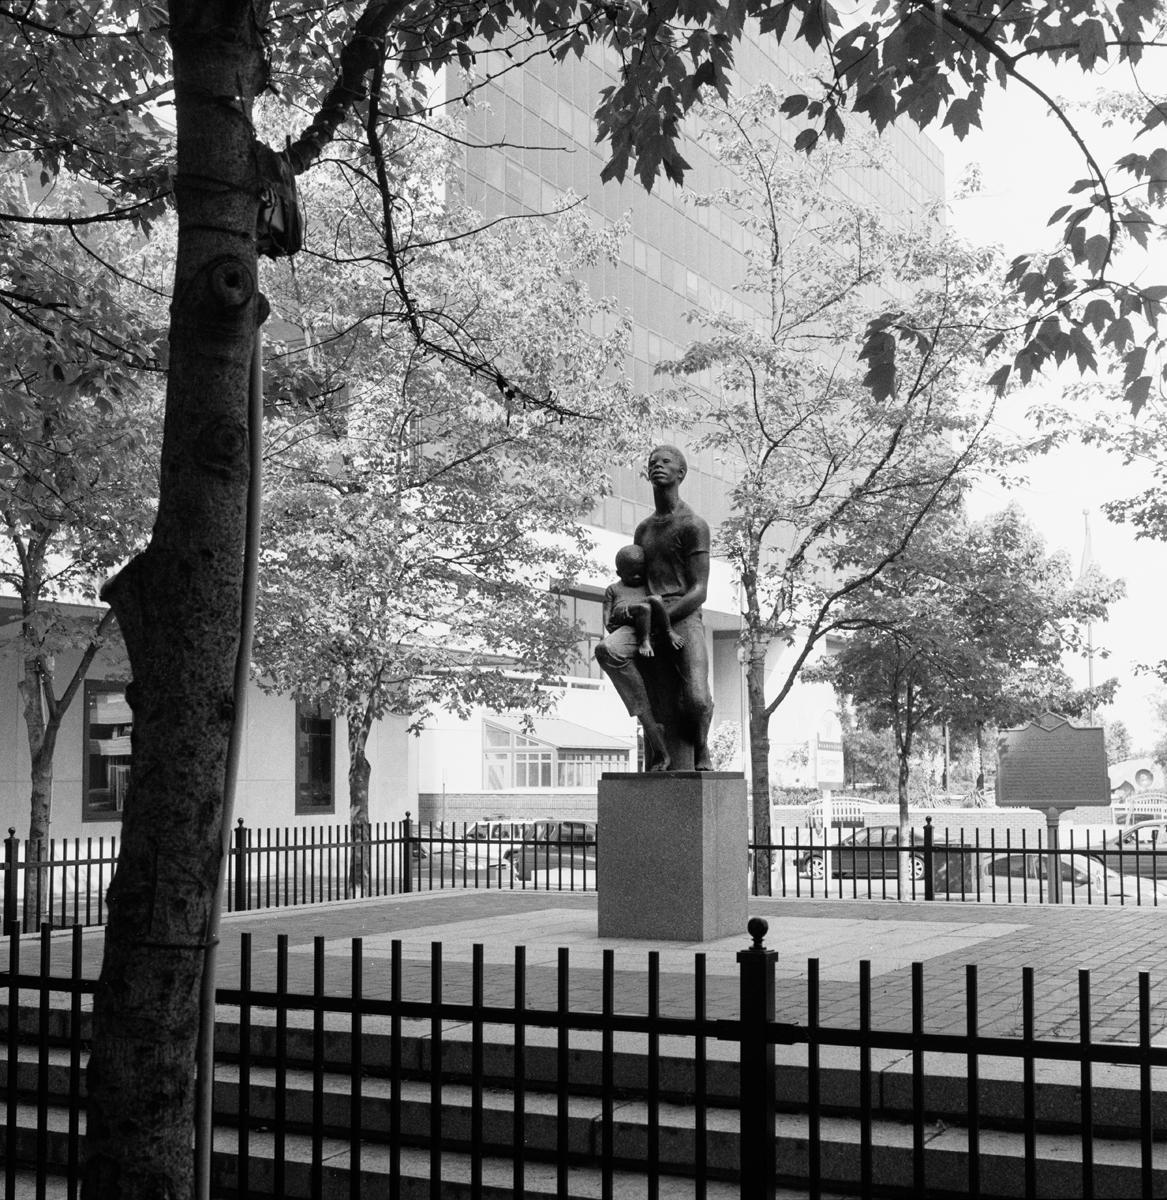 Bishop Peter Spencer Memorial and Grave, Wilmington, Delaware, 2006